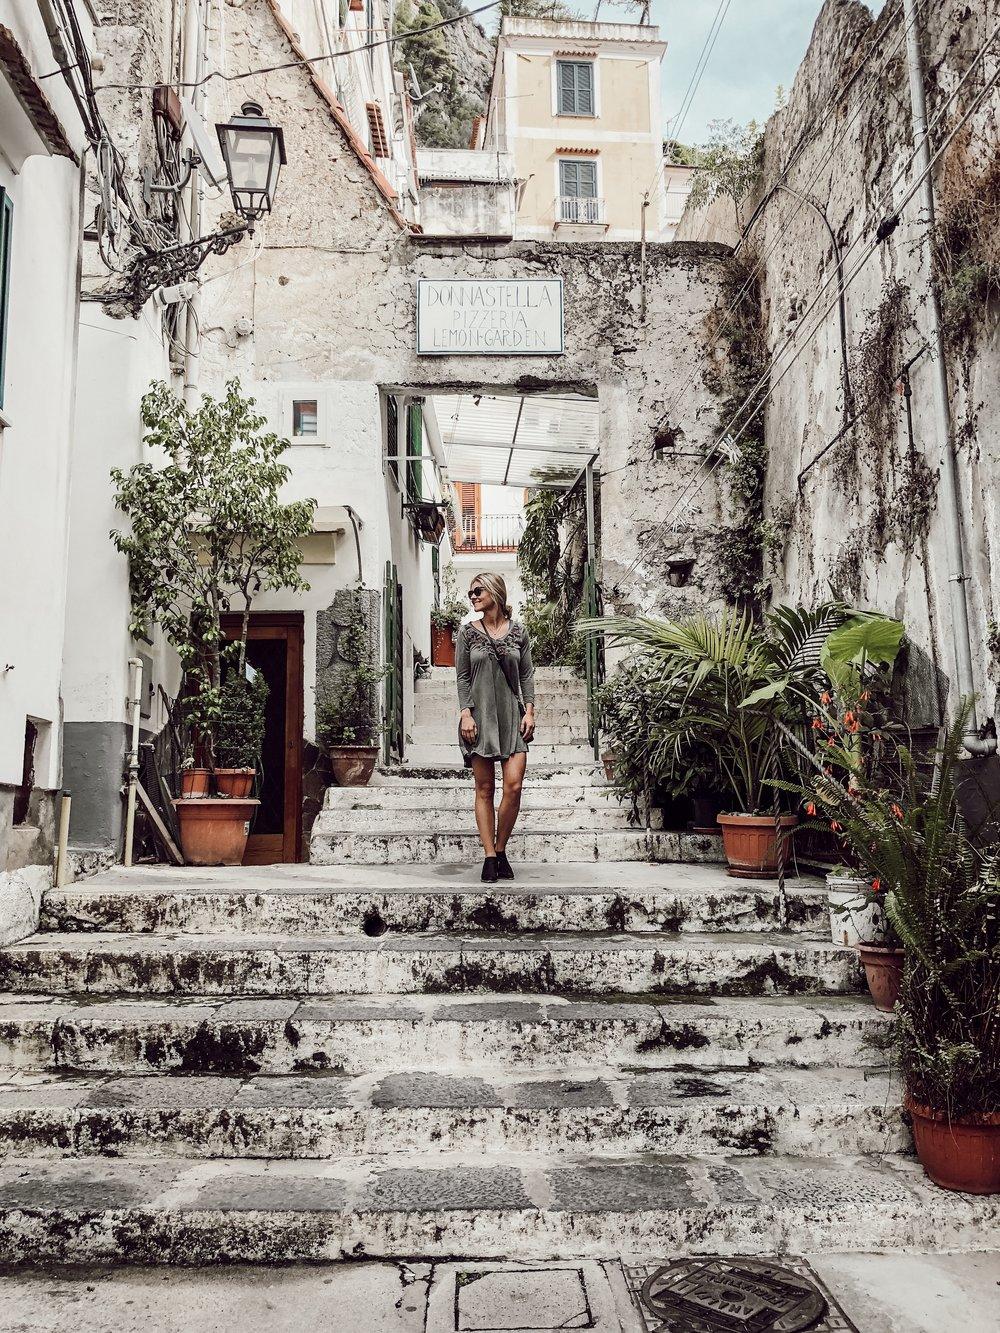 Best Pizza in Amalfi, Italy | Miranda Schroeder Blog